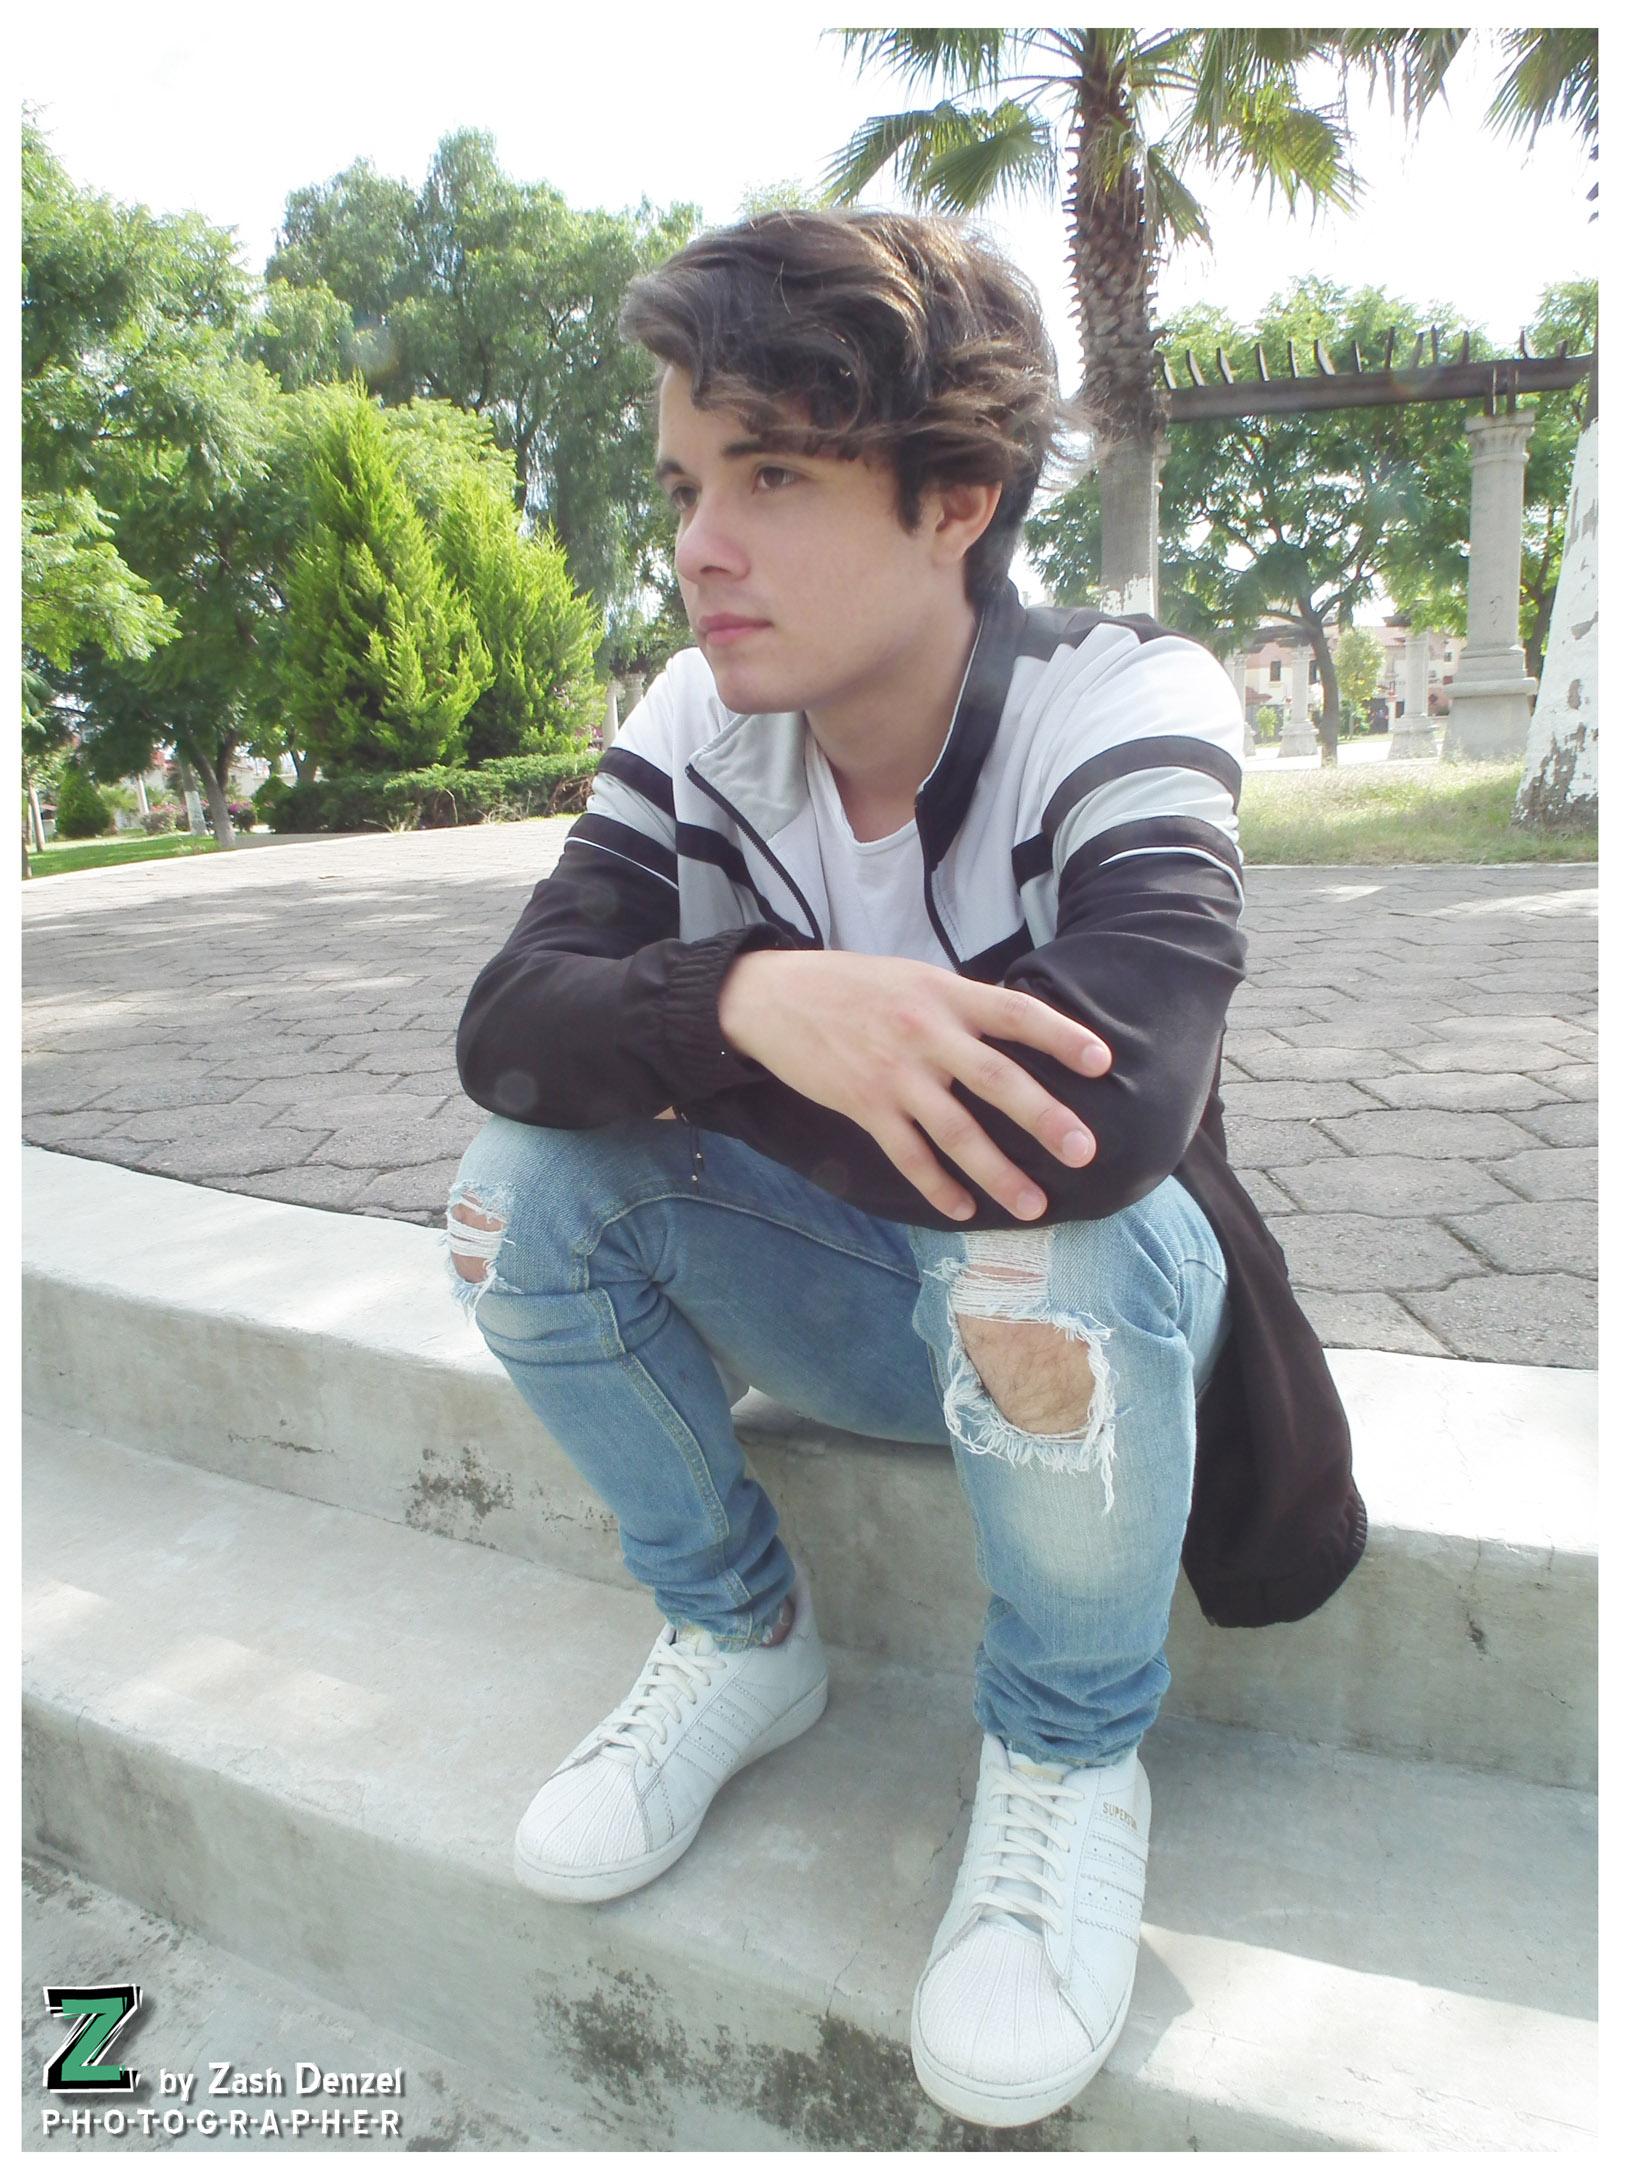 Model: Luis Morato 5